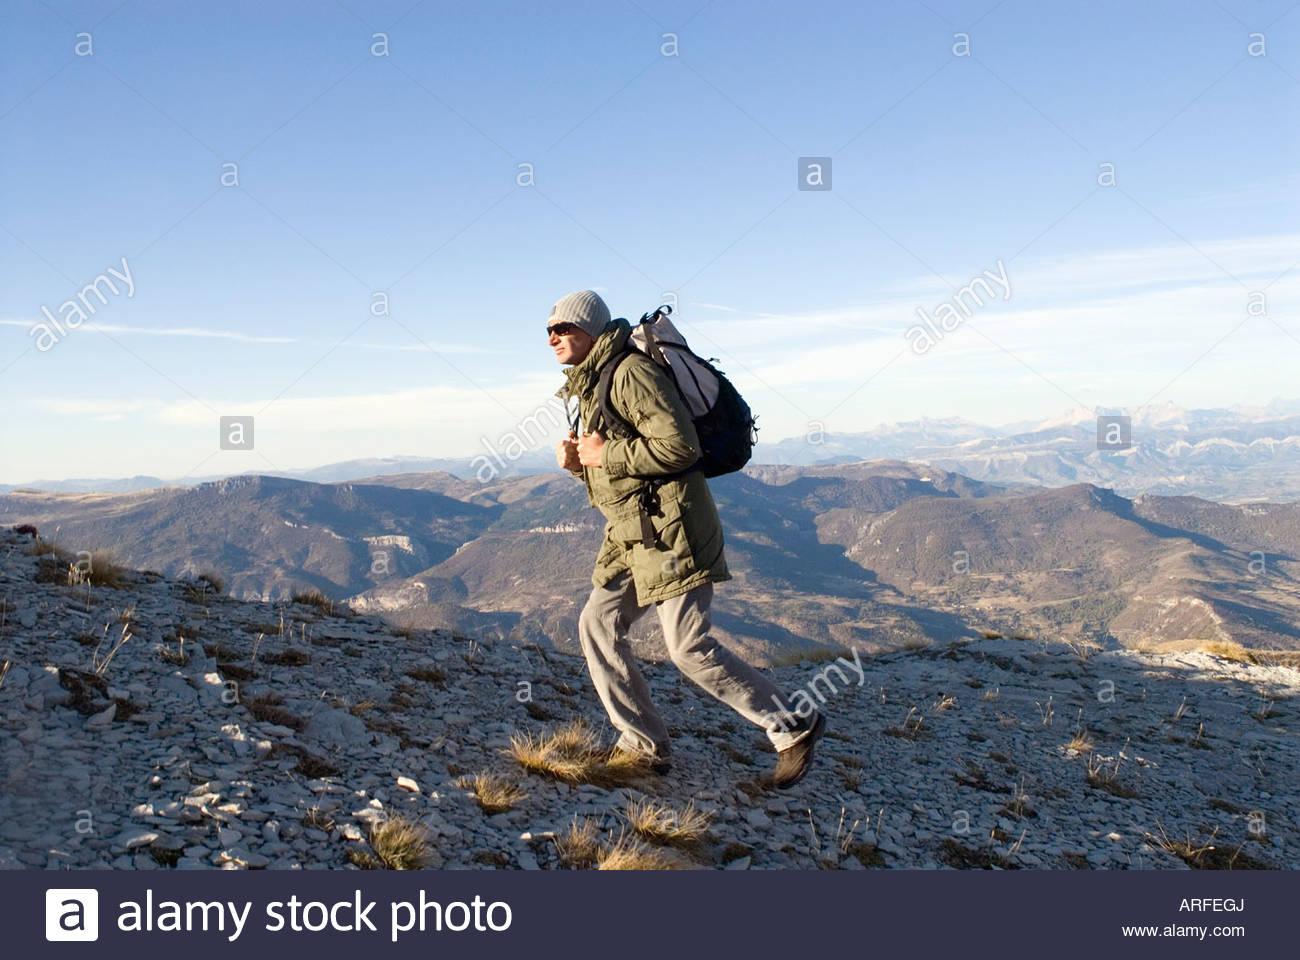 Man on a trek - Stock Image